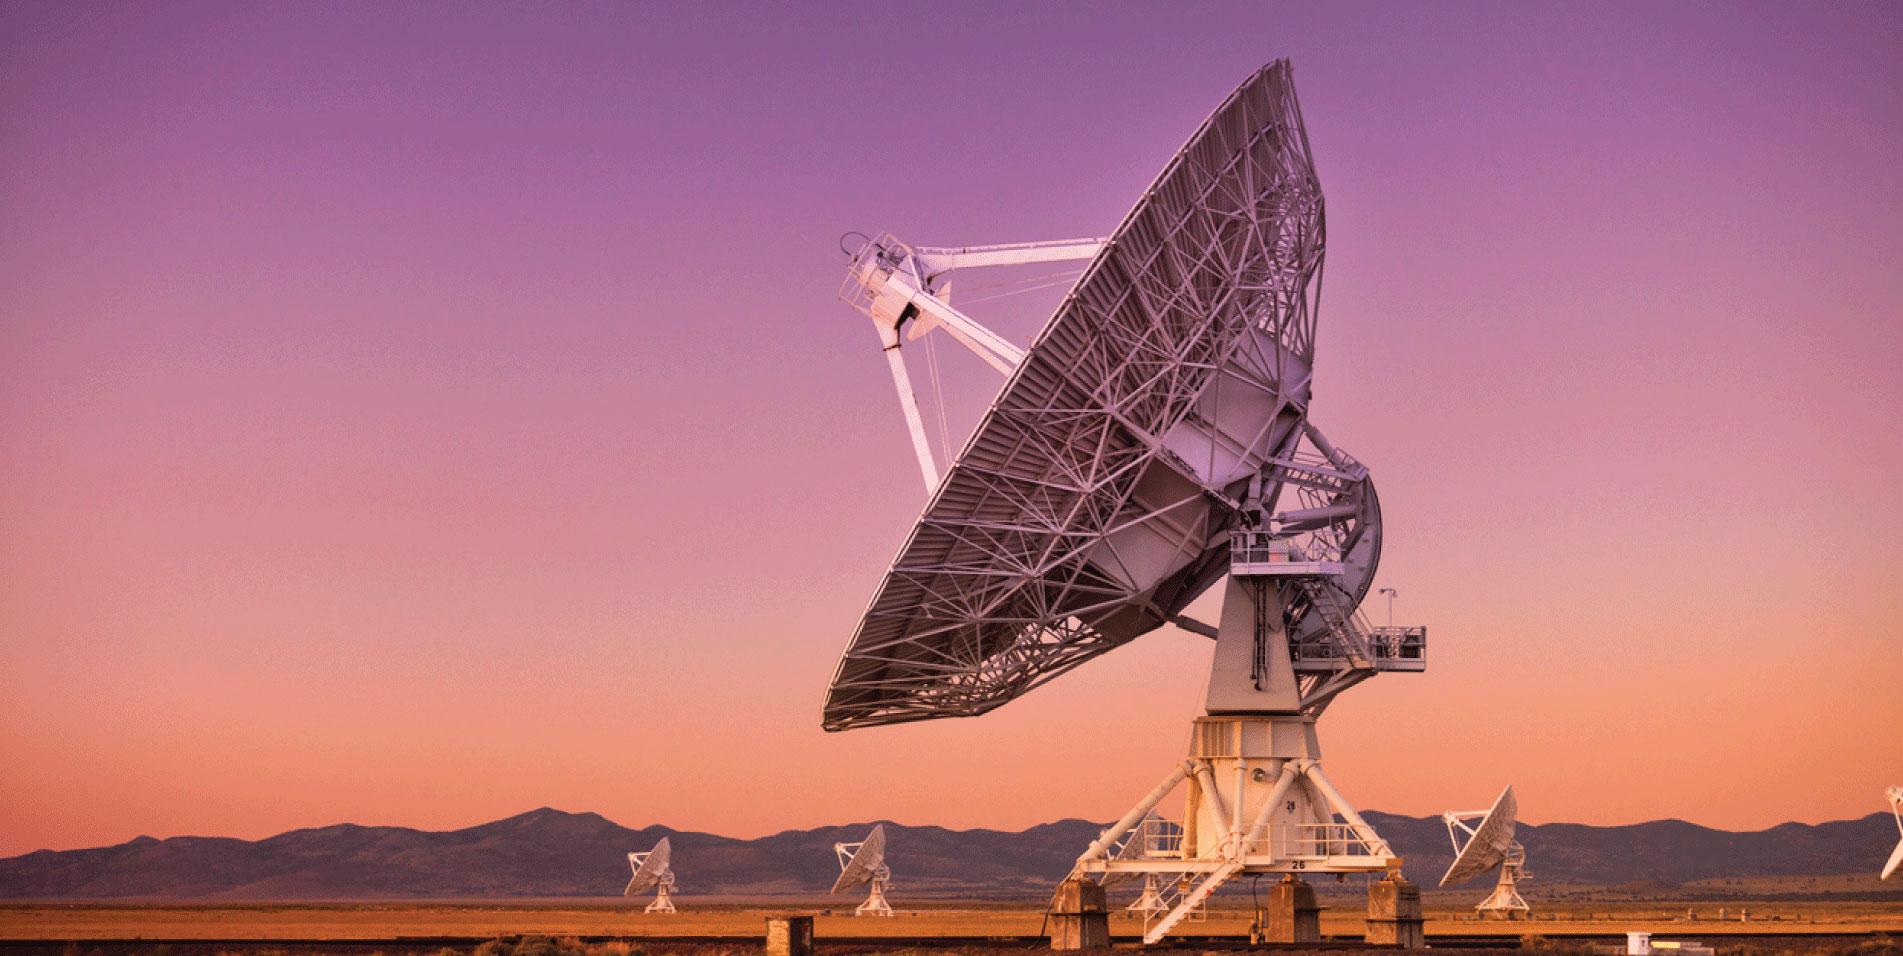 Array of large powered radio telescopes at sunset.